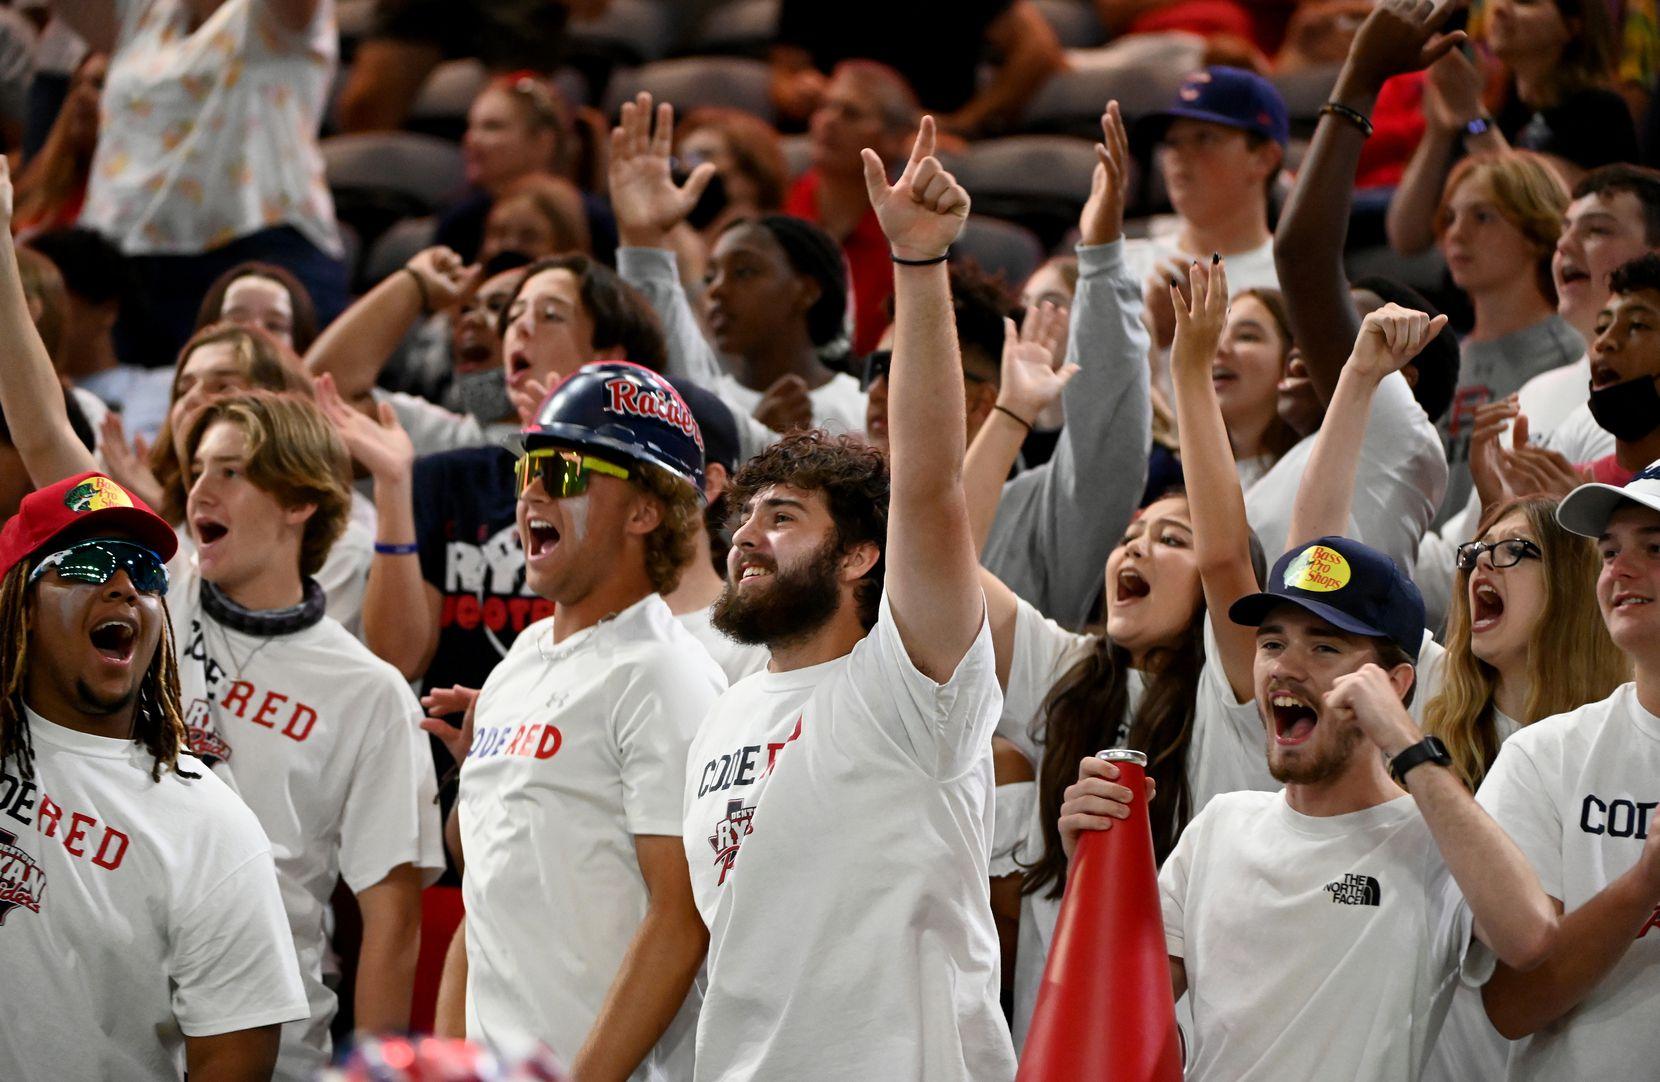 Denton Ryan students cheer in the first half during a high school football game between Longview and Denton Ryan, Saturday, Aug. 28, 2021, in Frisco, Texas. (Matt Strasen/Special Contributor)